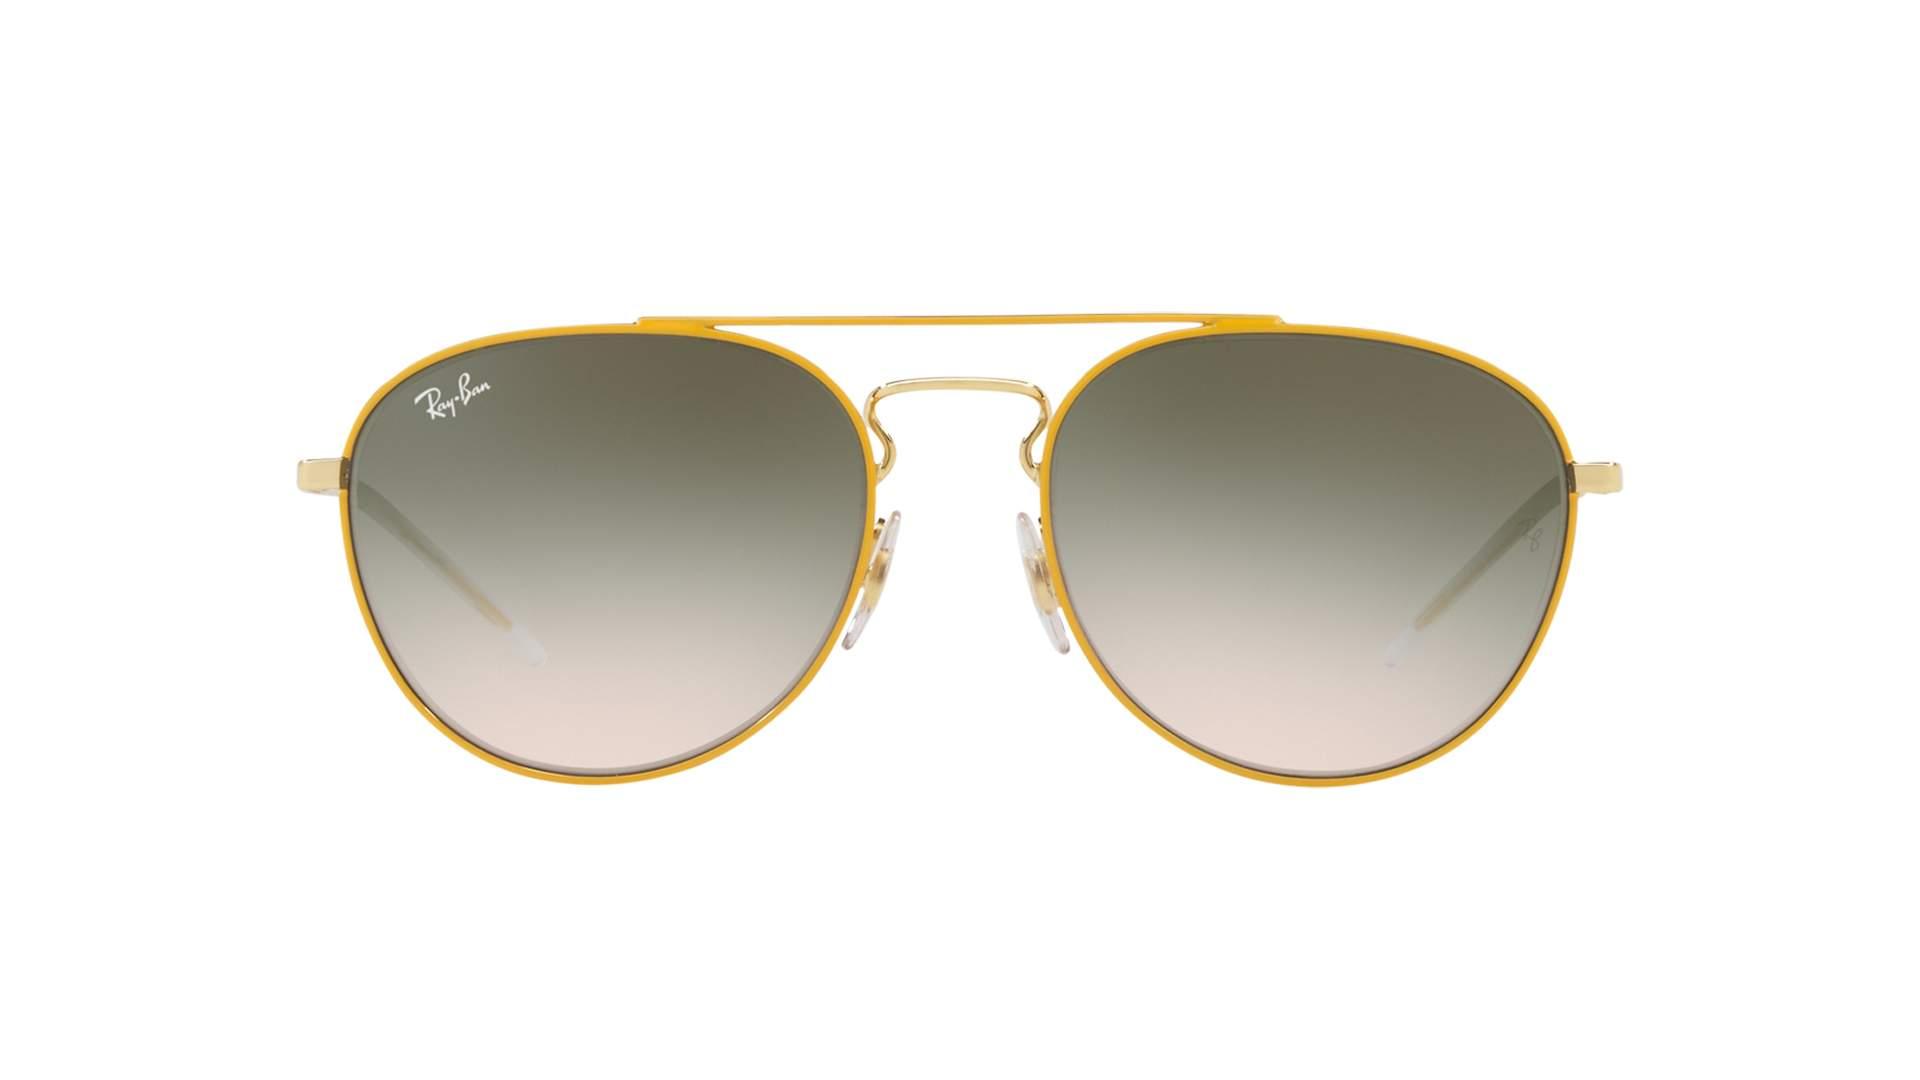 30823359421 Sunglasses Ray-Ban RB3589 9058 2C 55-18 Yellow Medium Gradient